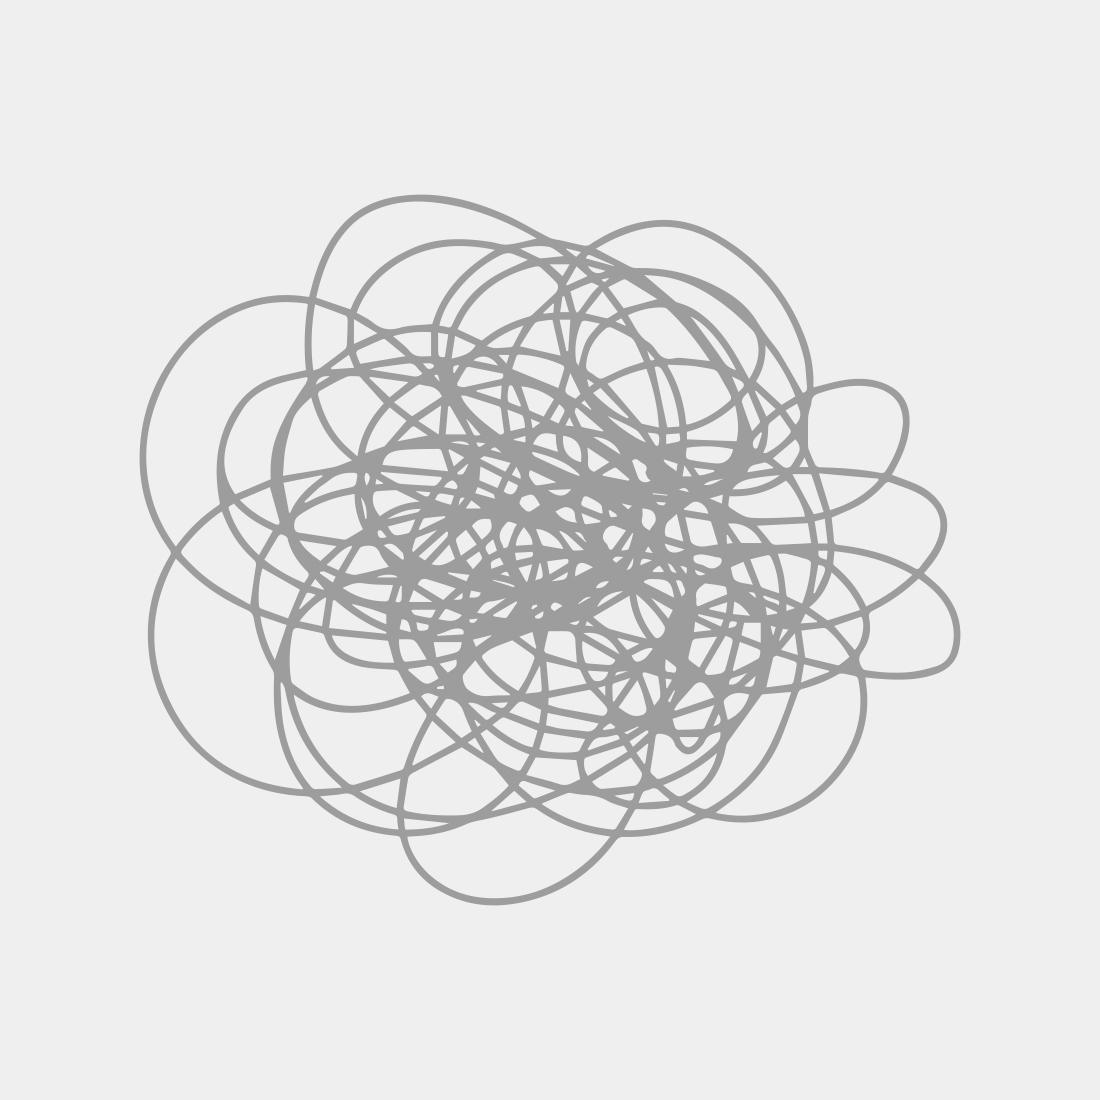 Exhibition Poster John Everett Millais 1967